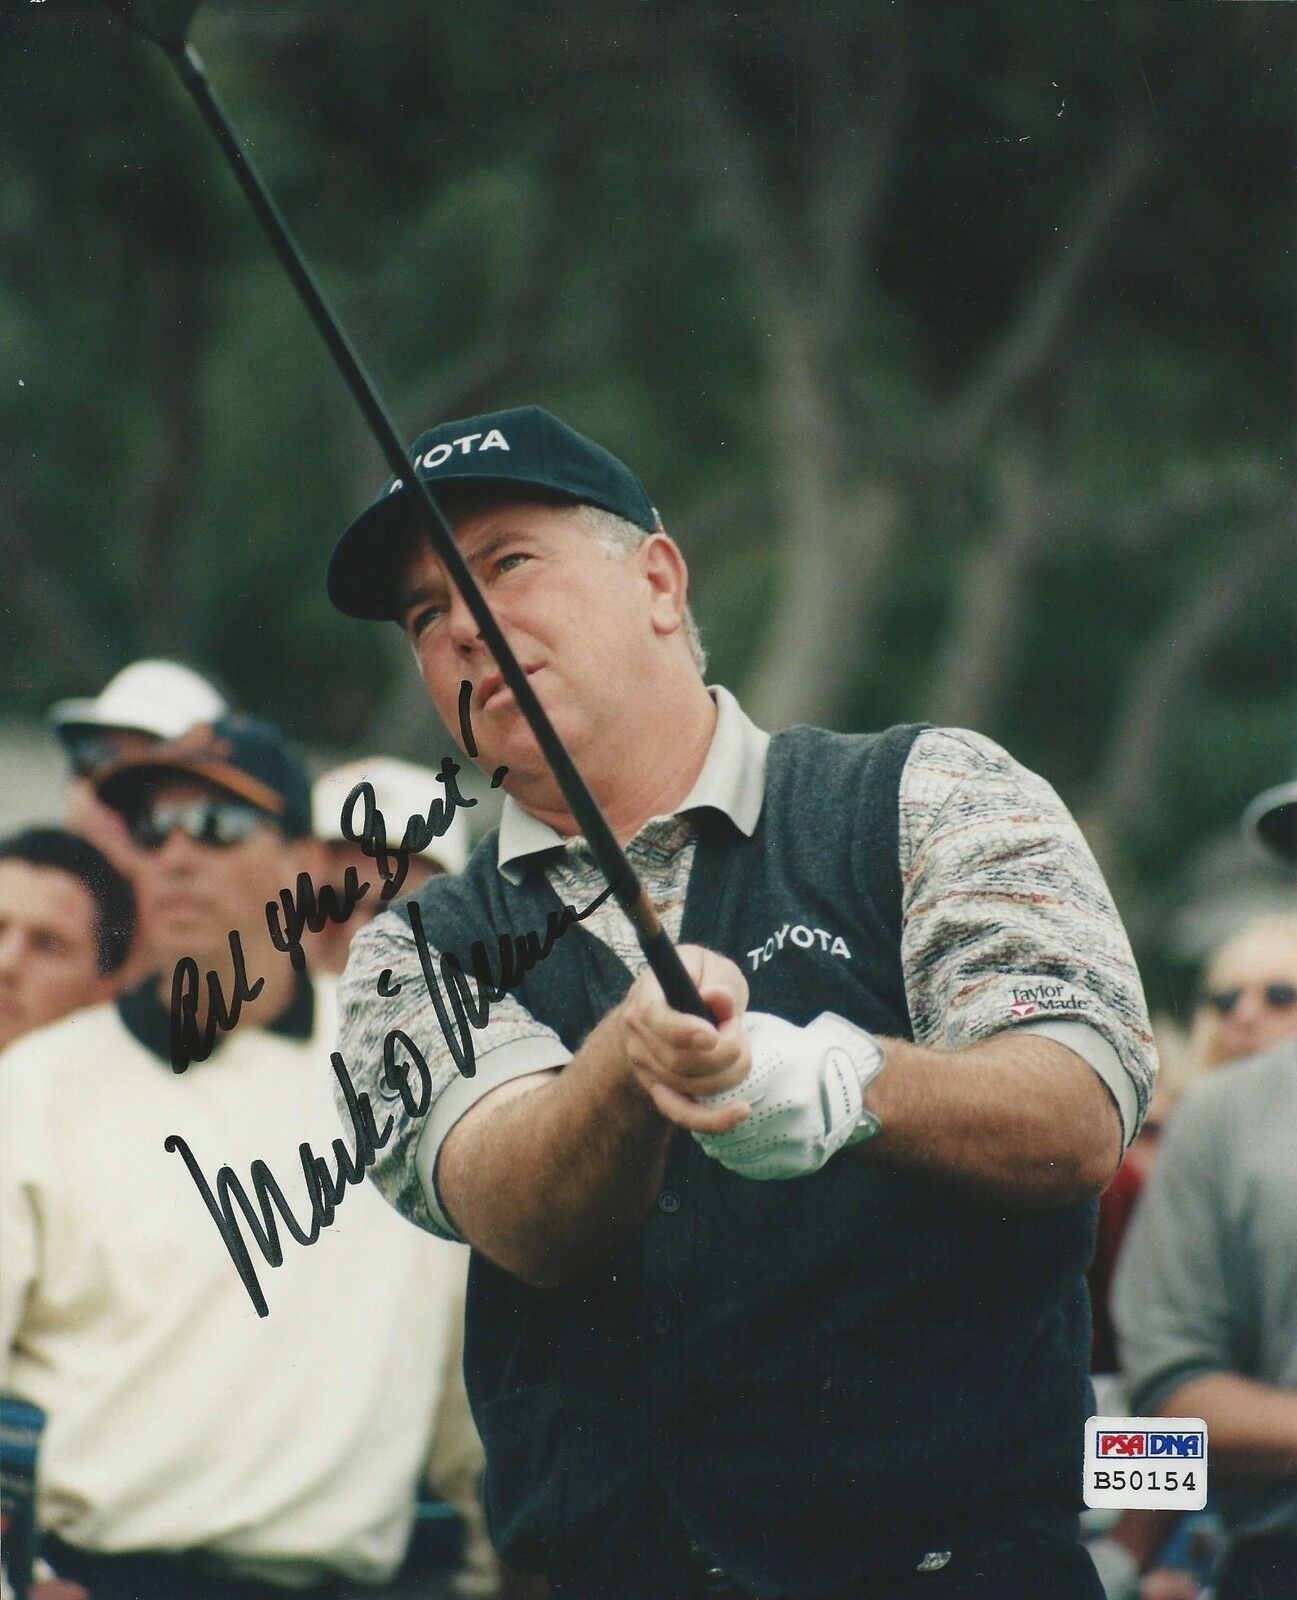 Mark O'Meara PGA Golfer signed 8x10 photo PSA/DNA #B50154